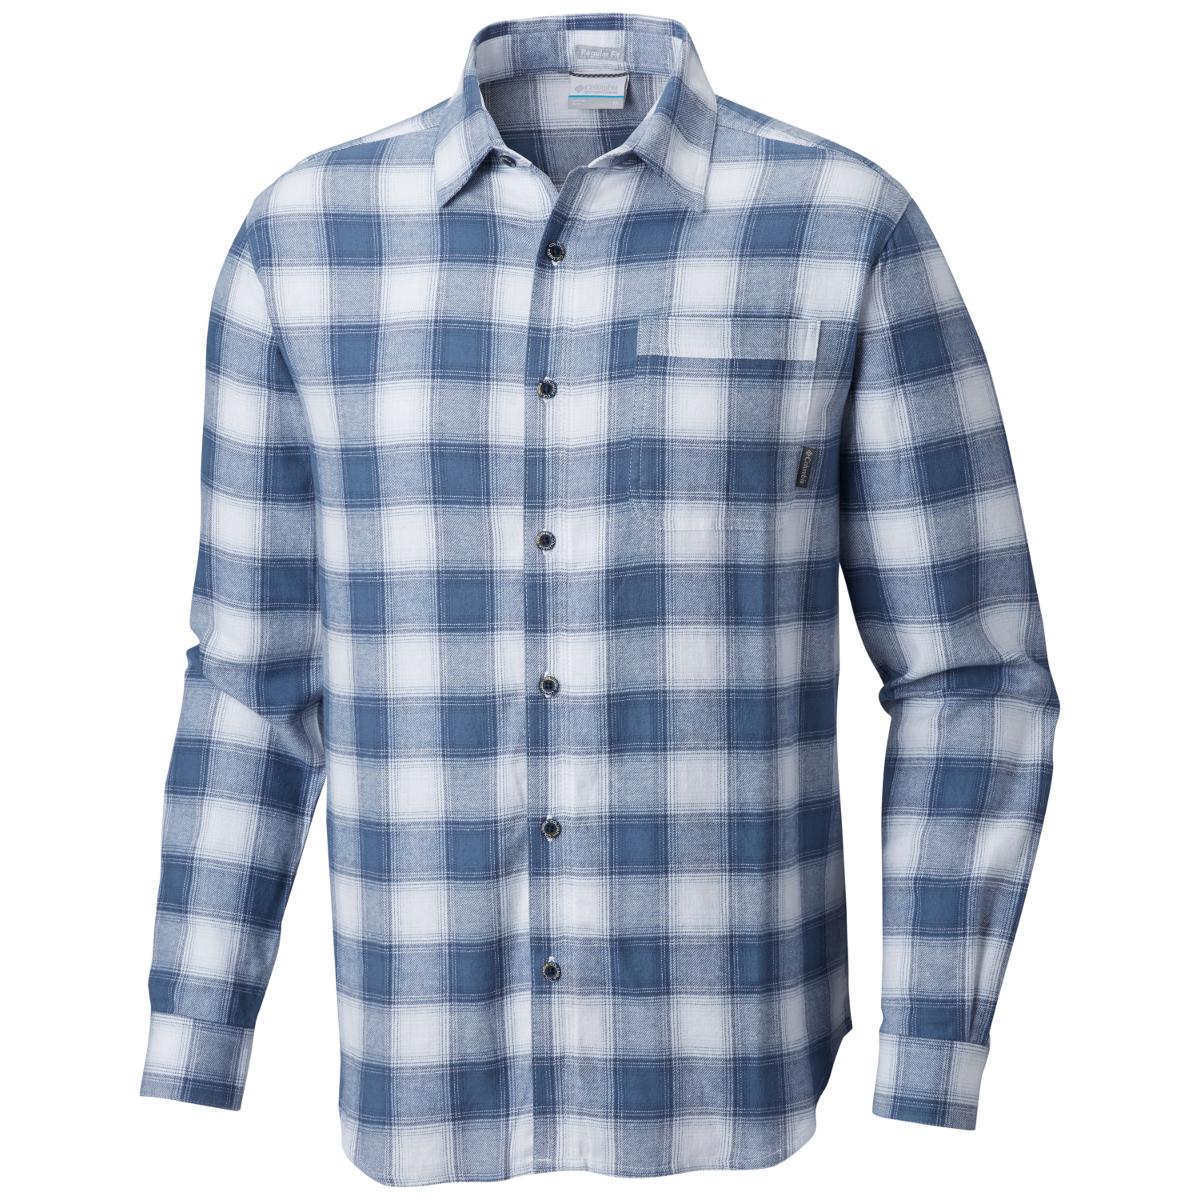 Columbia Men's Boulder Ridge Long-Sleeve Flannel Shirt - Blue, XXL